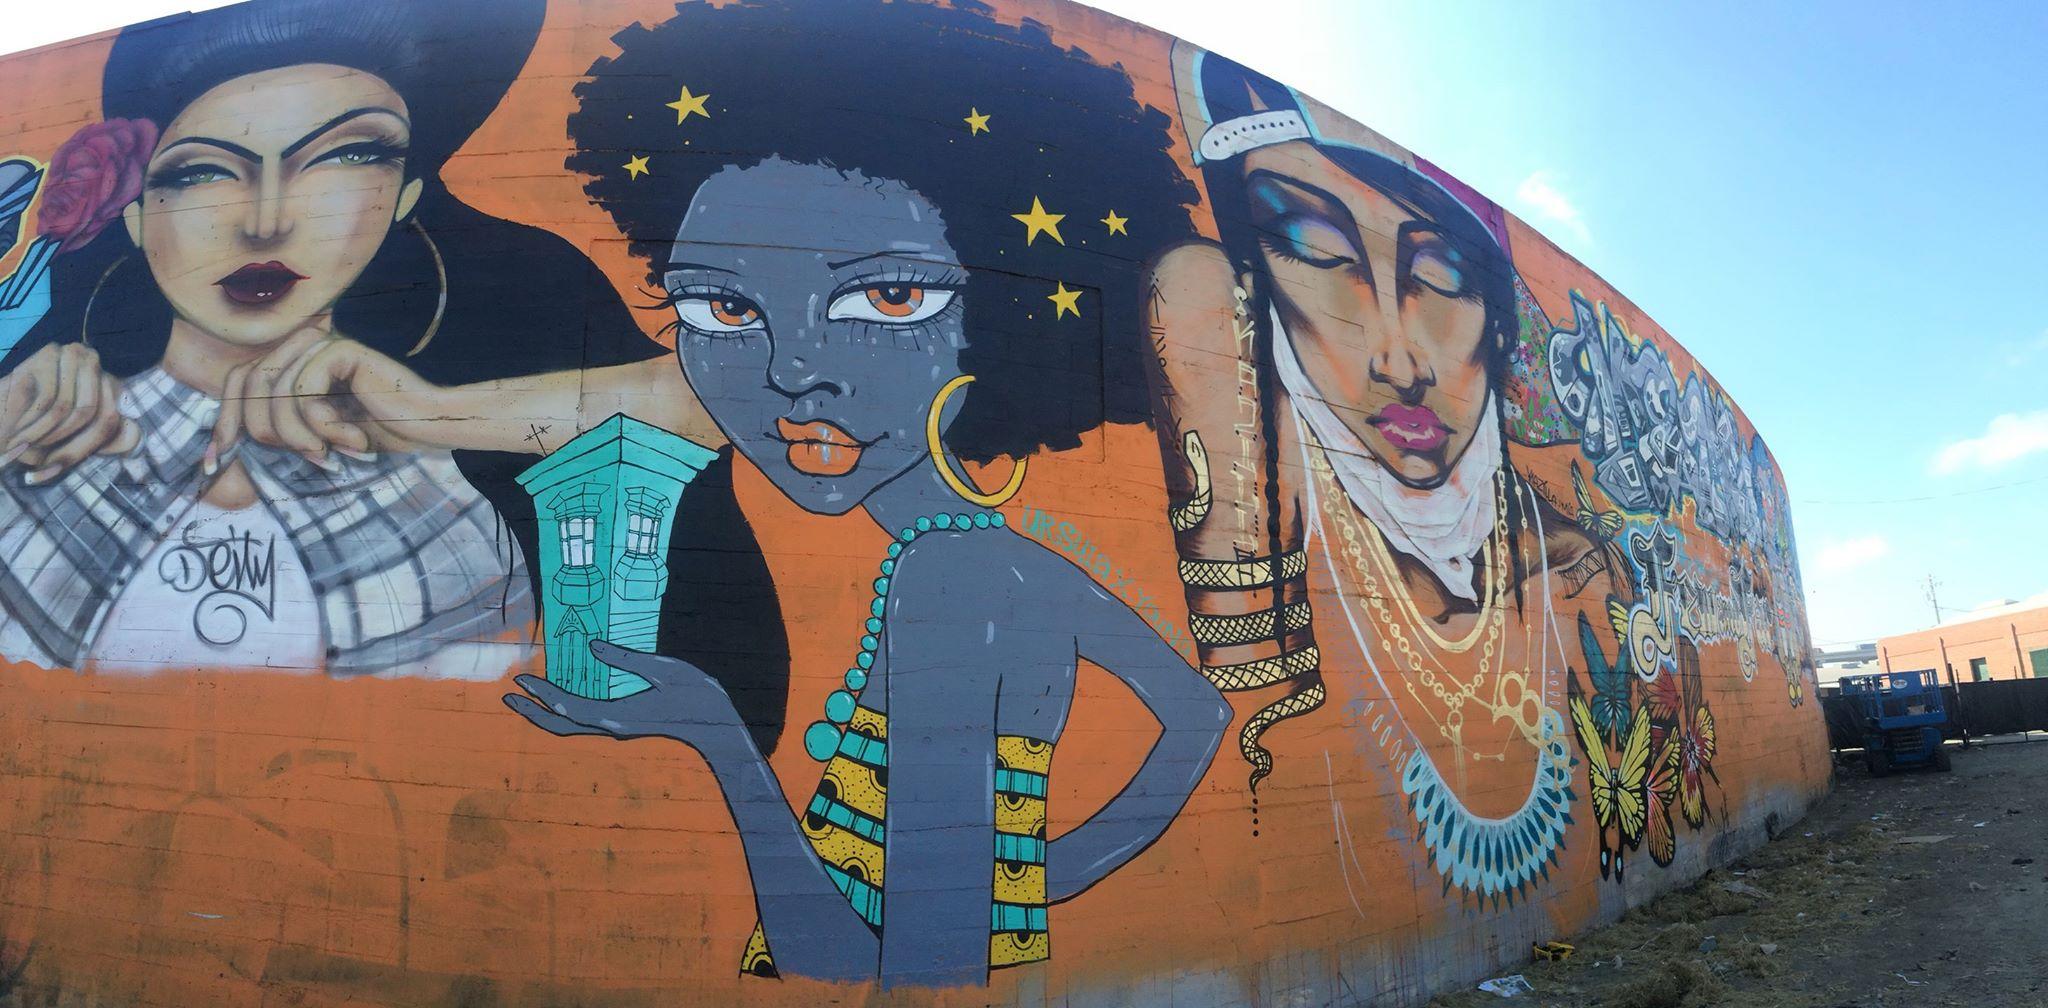 Oakland, 2015